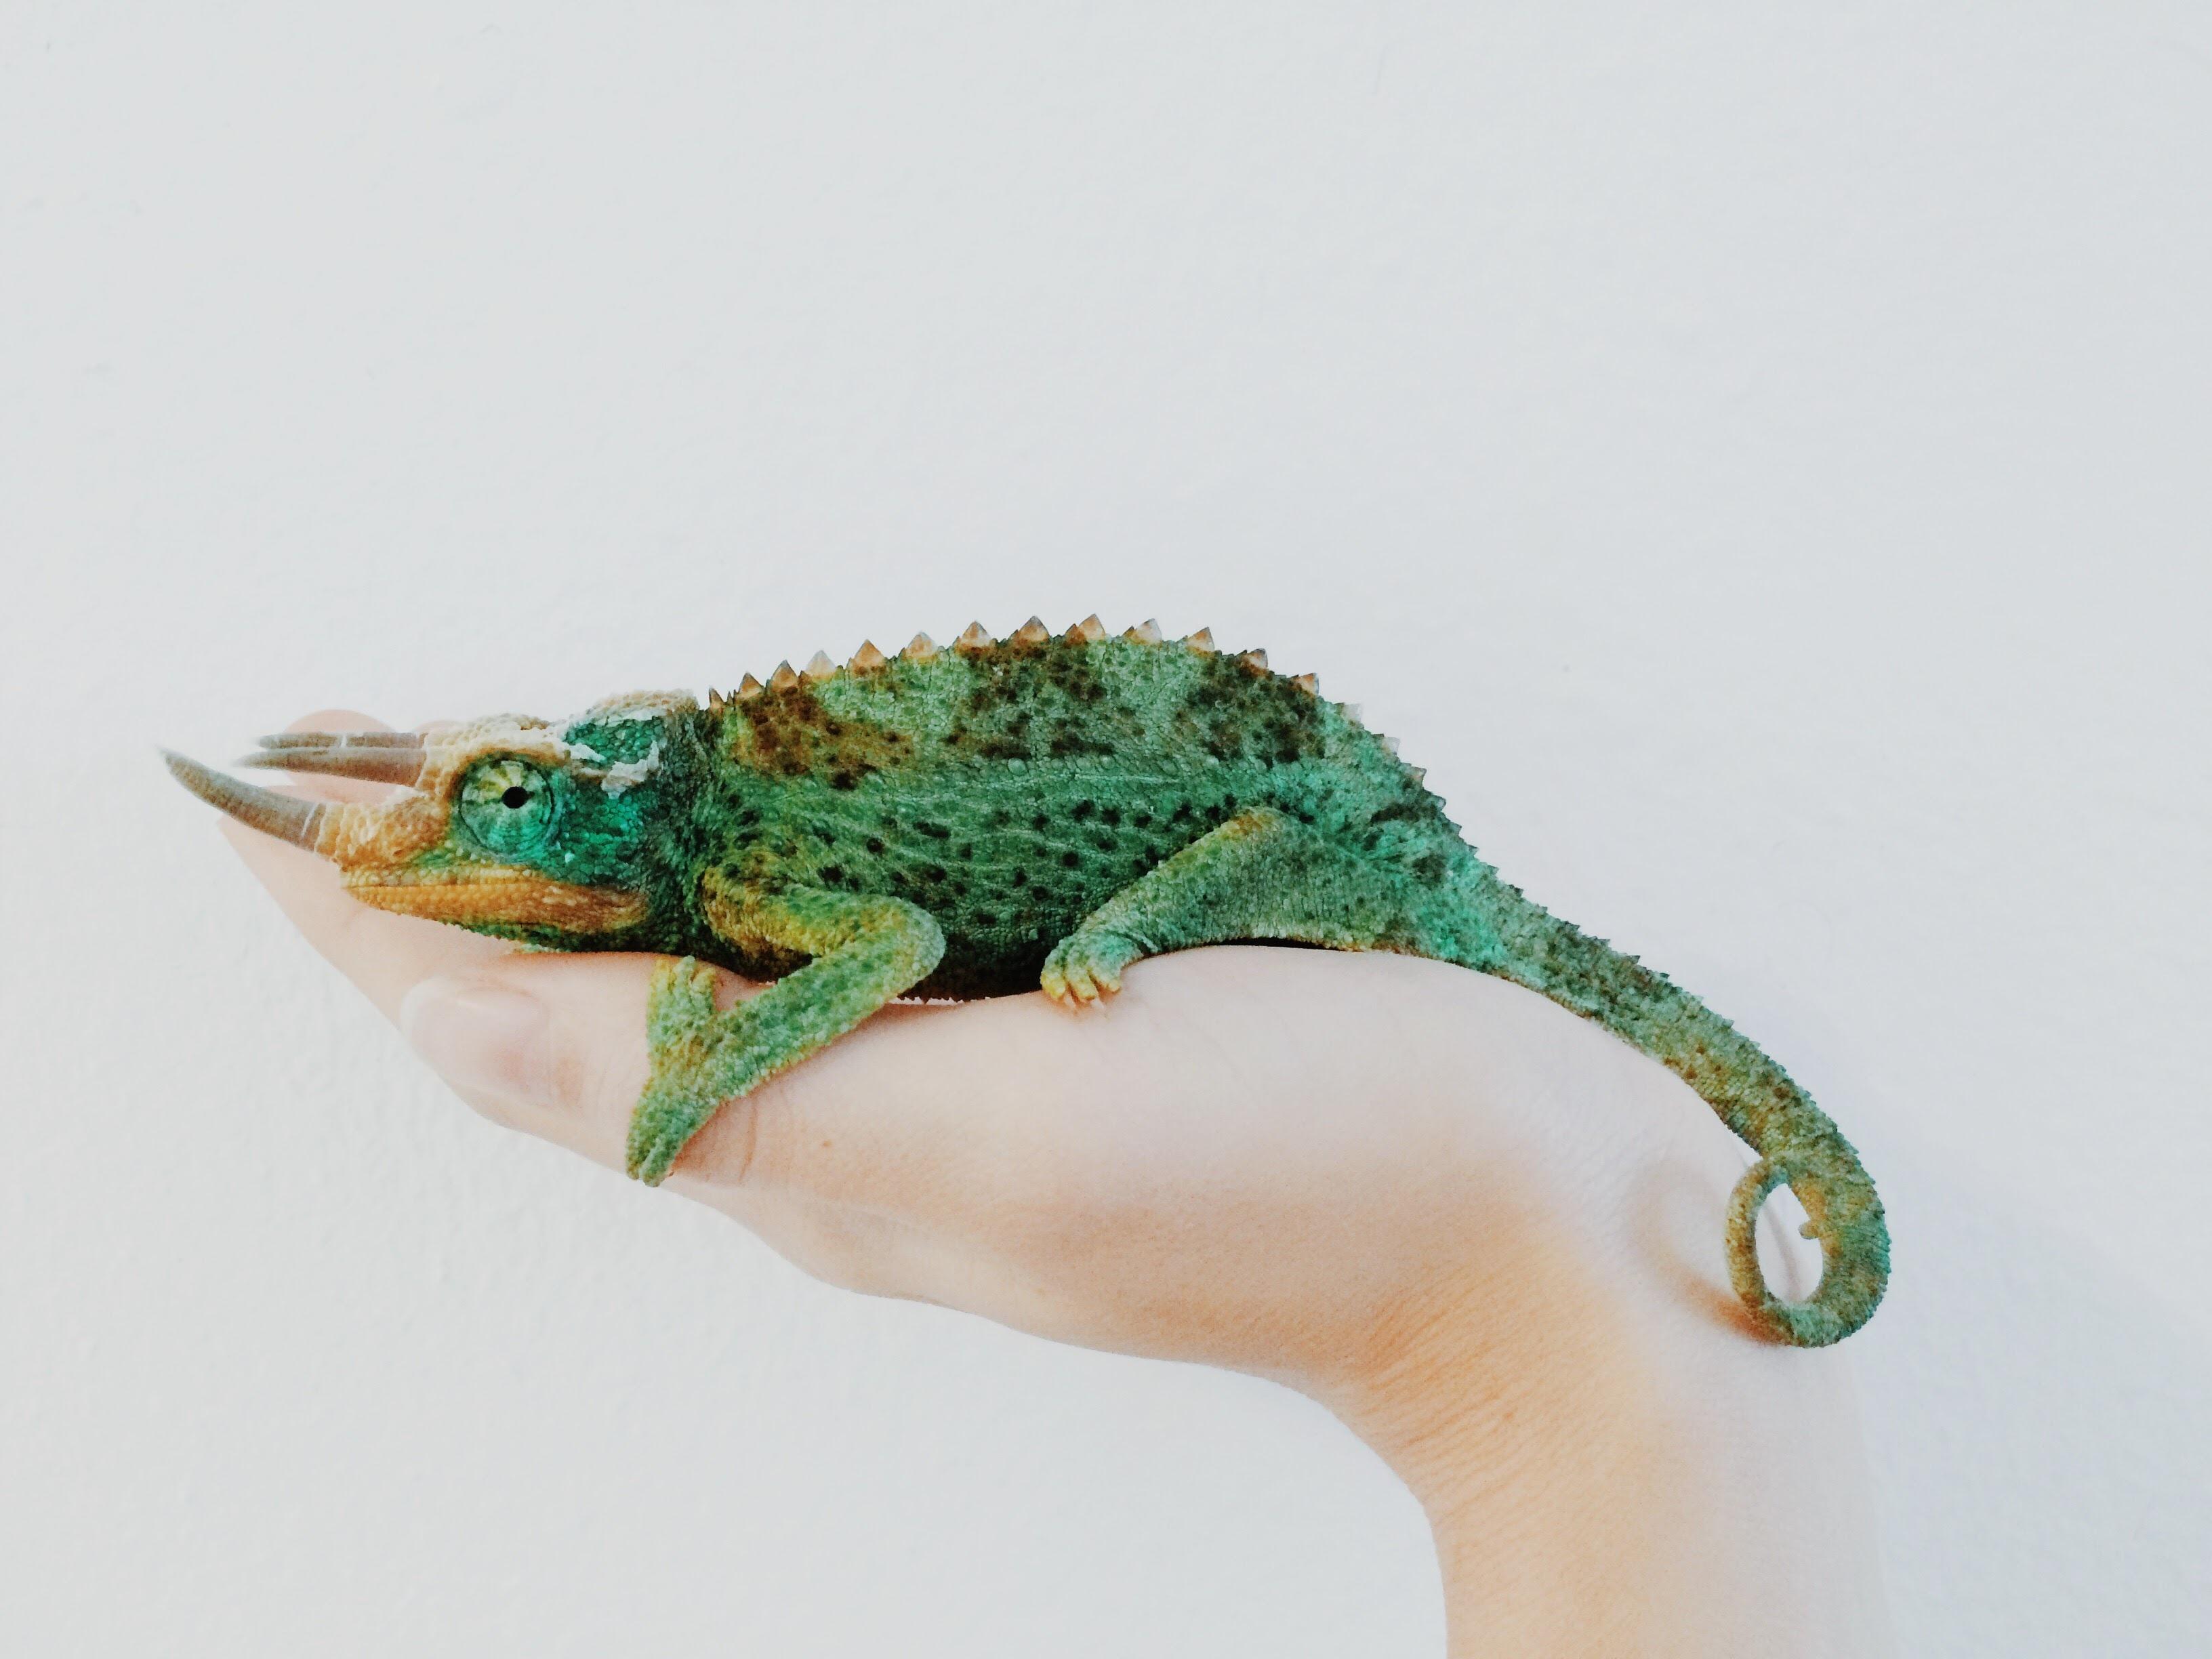 person holding green chameleon